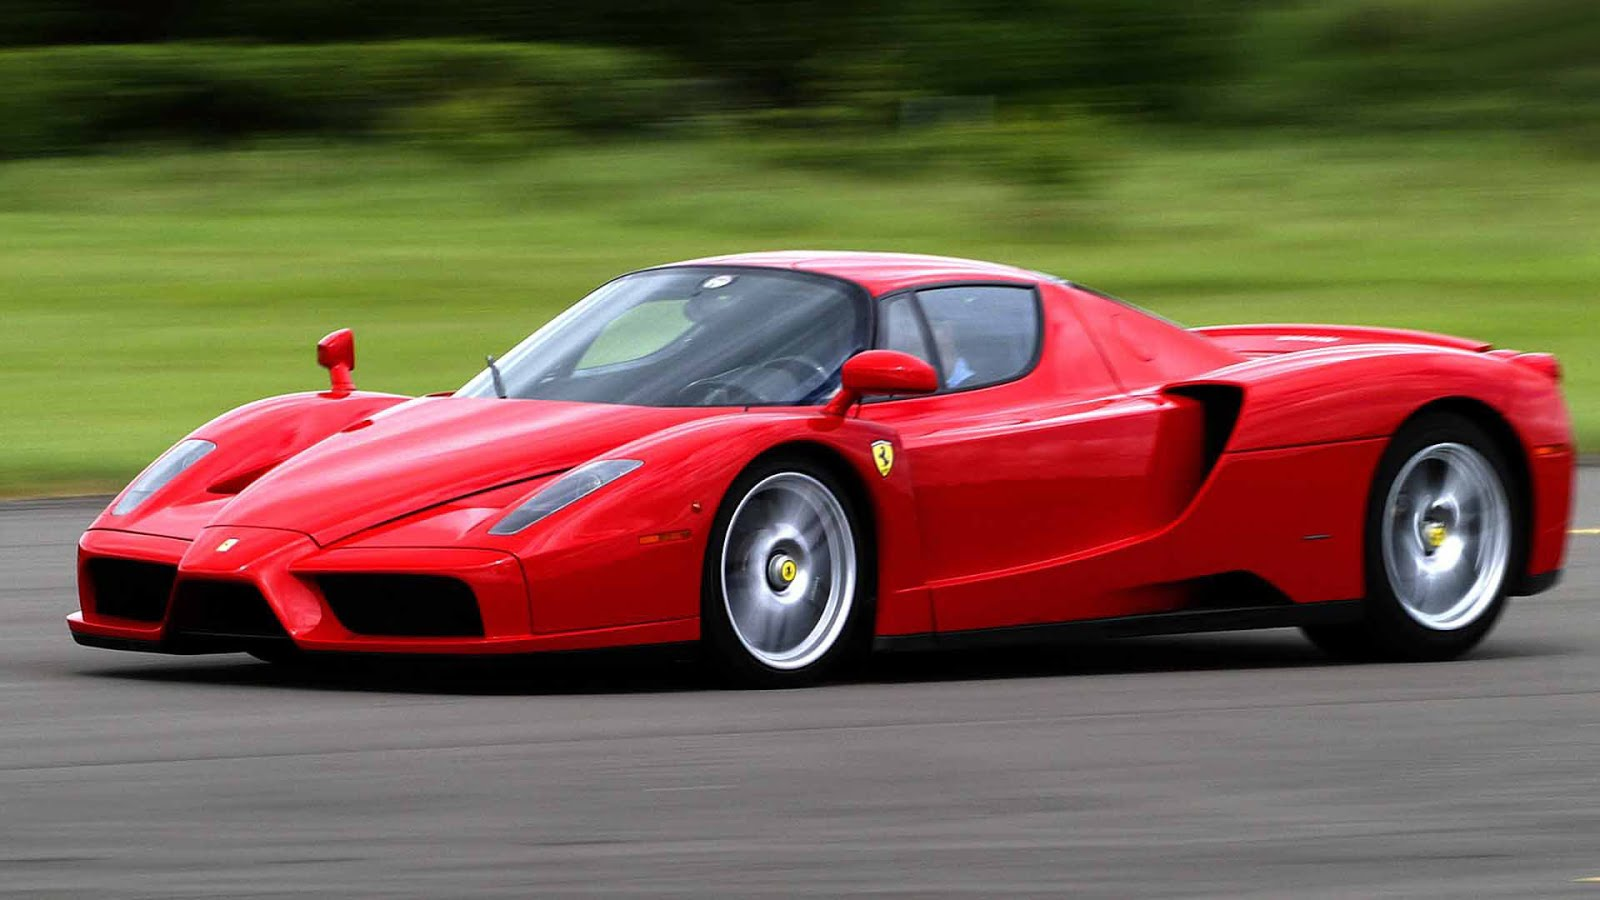 Ferrari Enzo 2014 Wallpaper